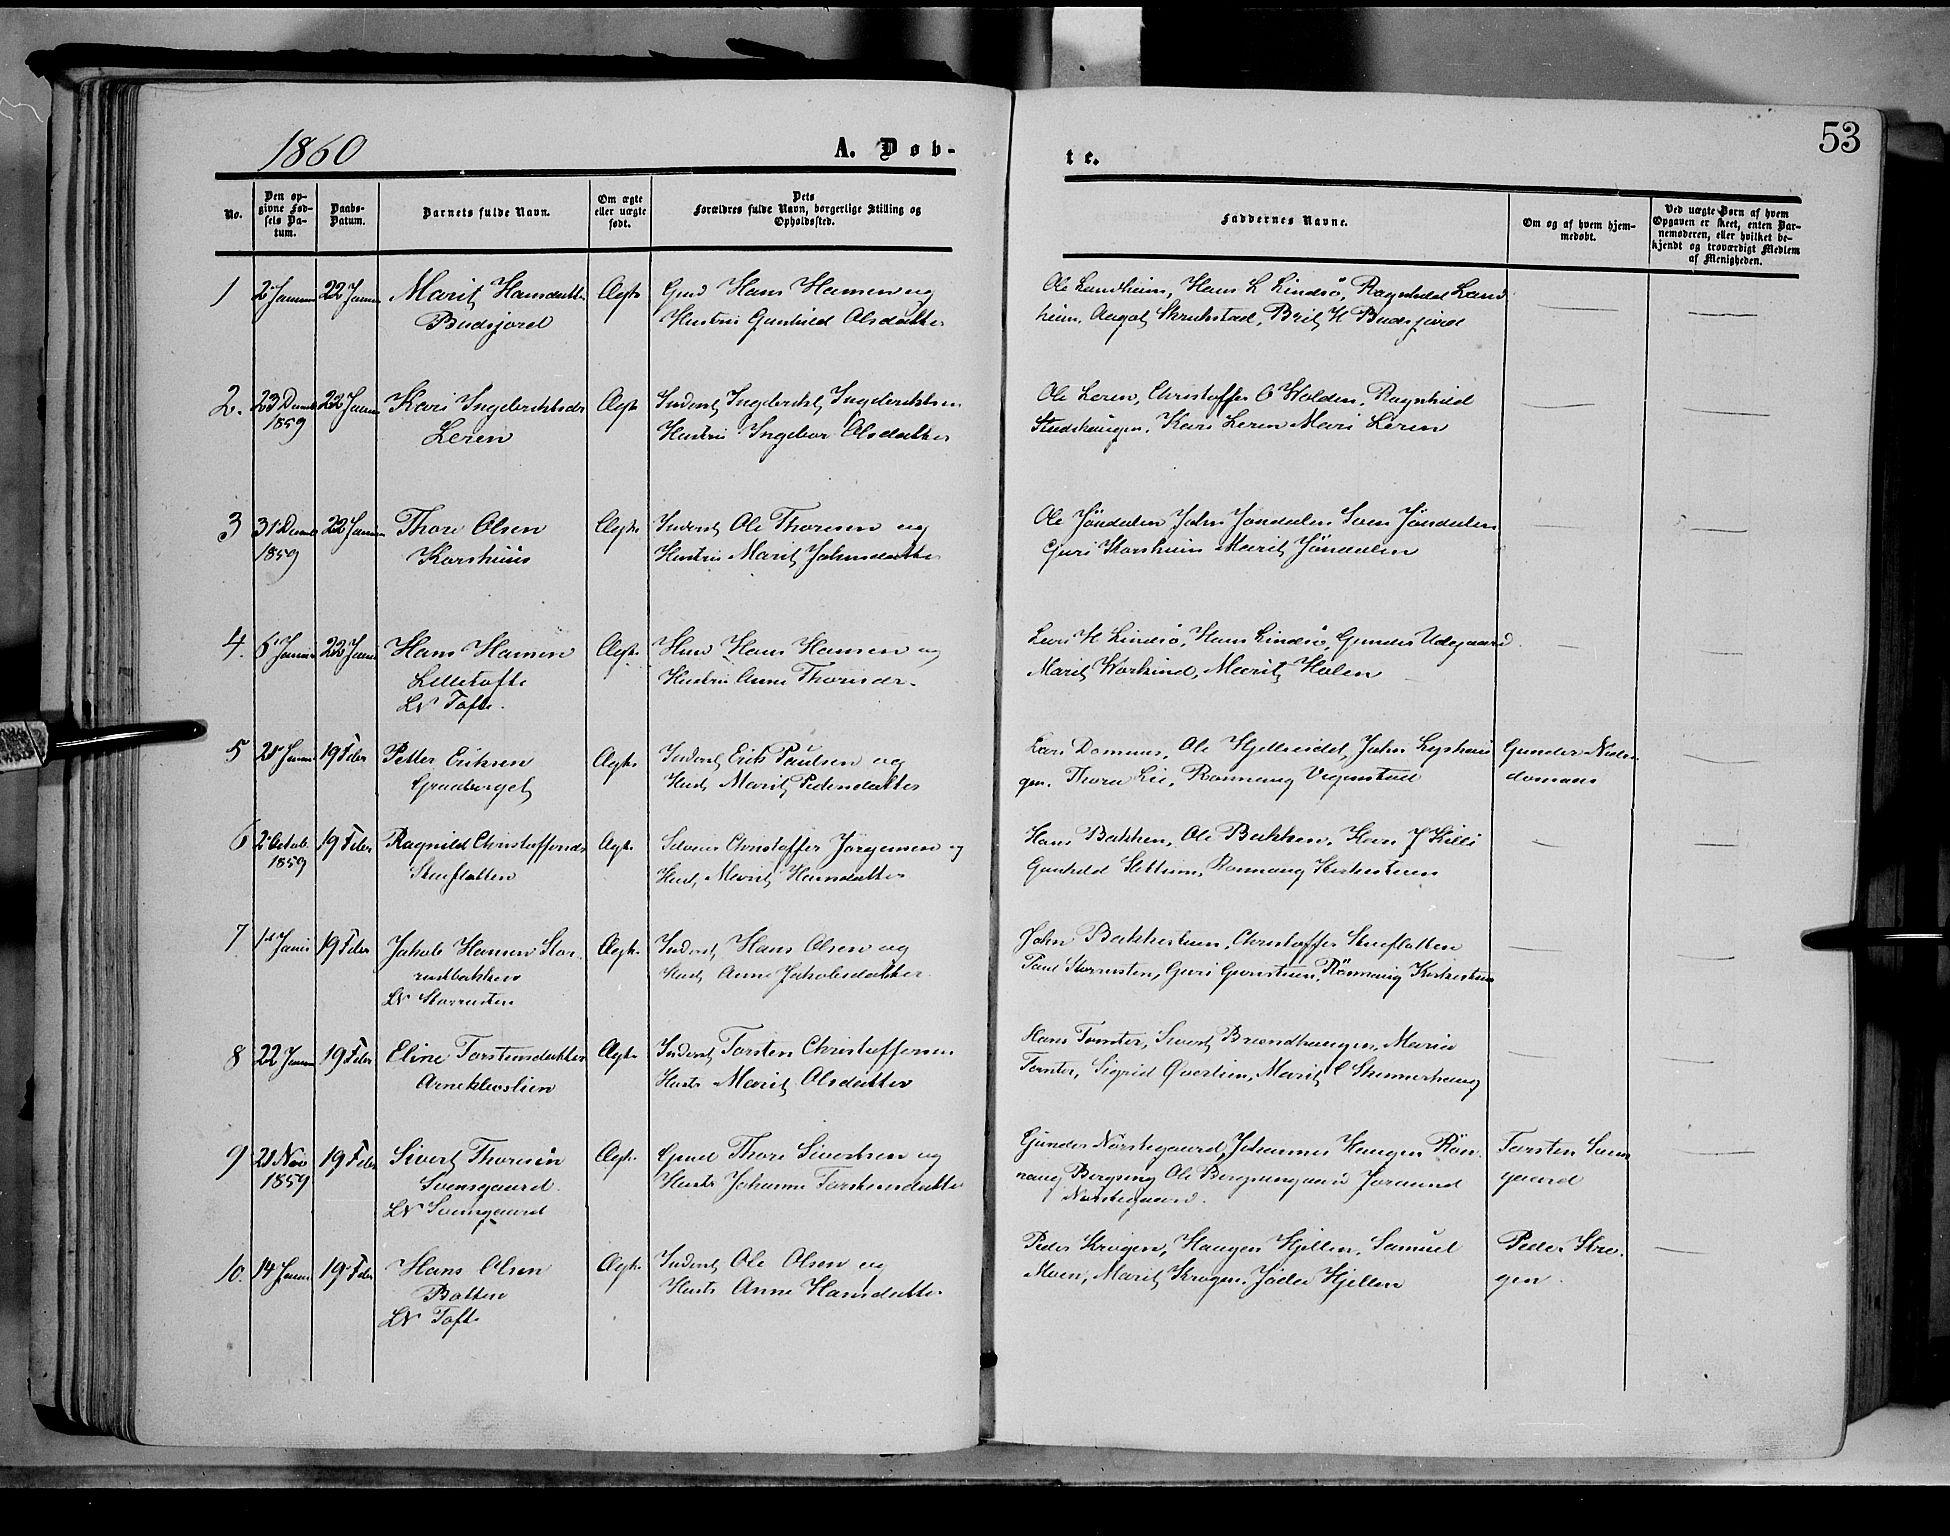 SAH, Dovre prestekontor, Ministerialbok nr. 1, 1854-1878, s. 53